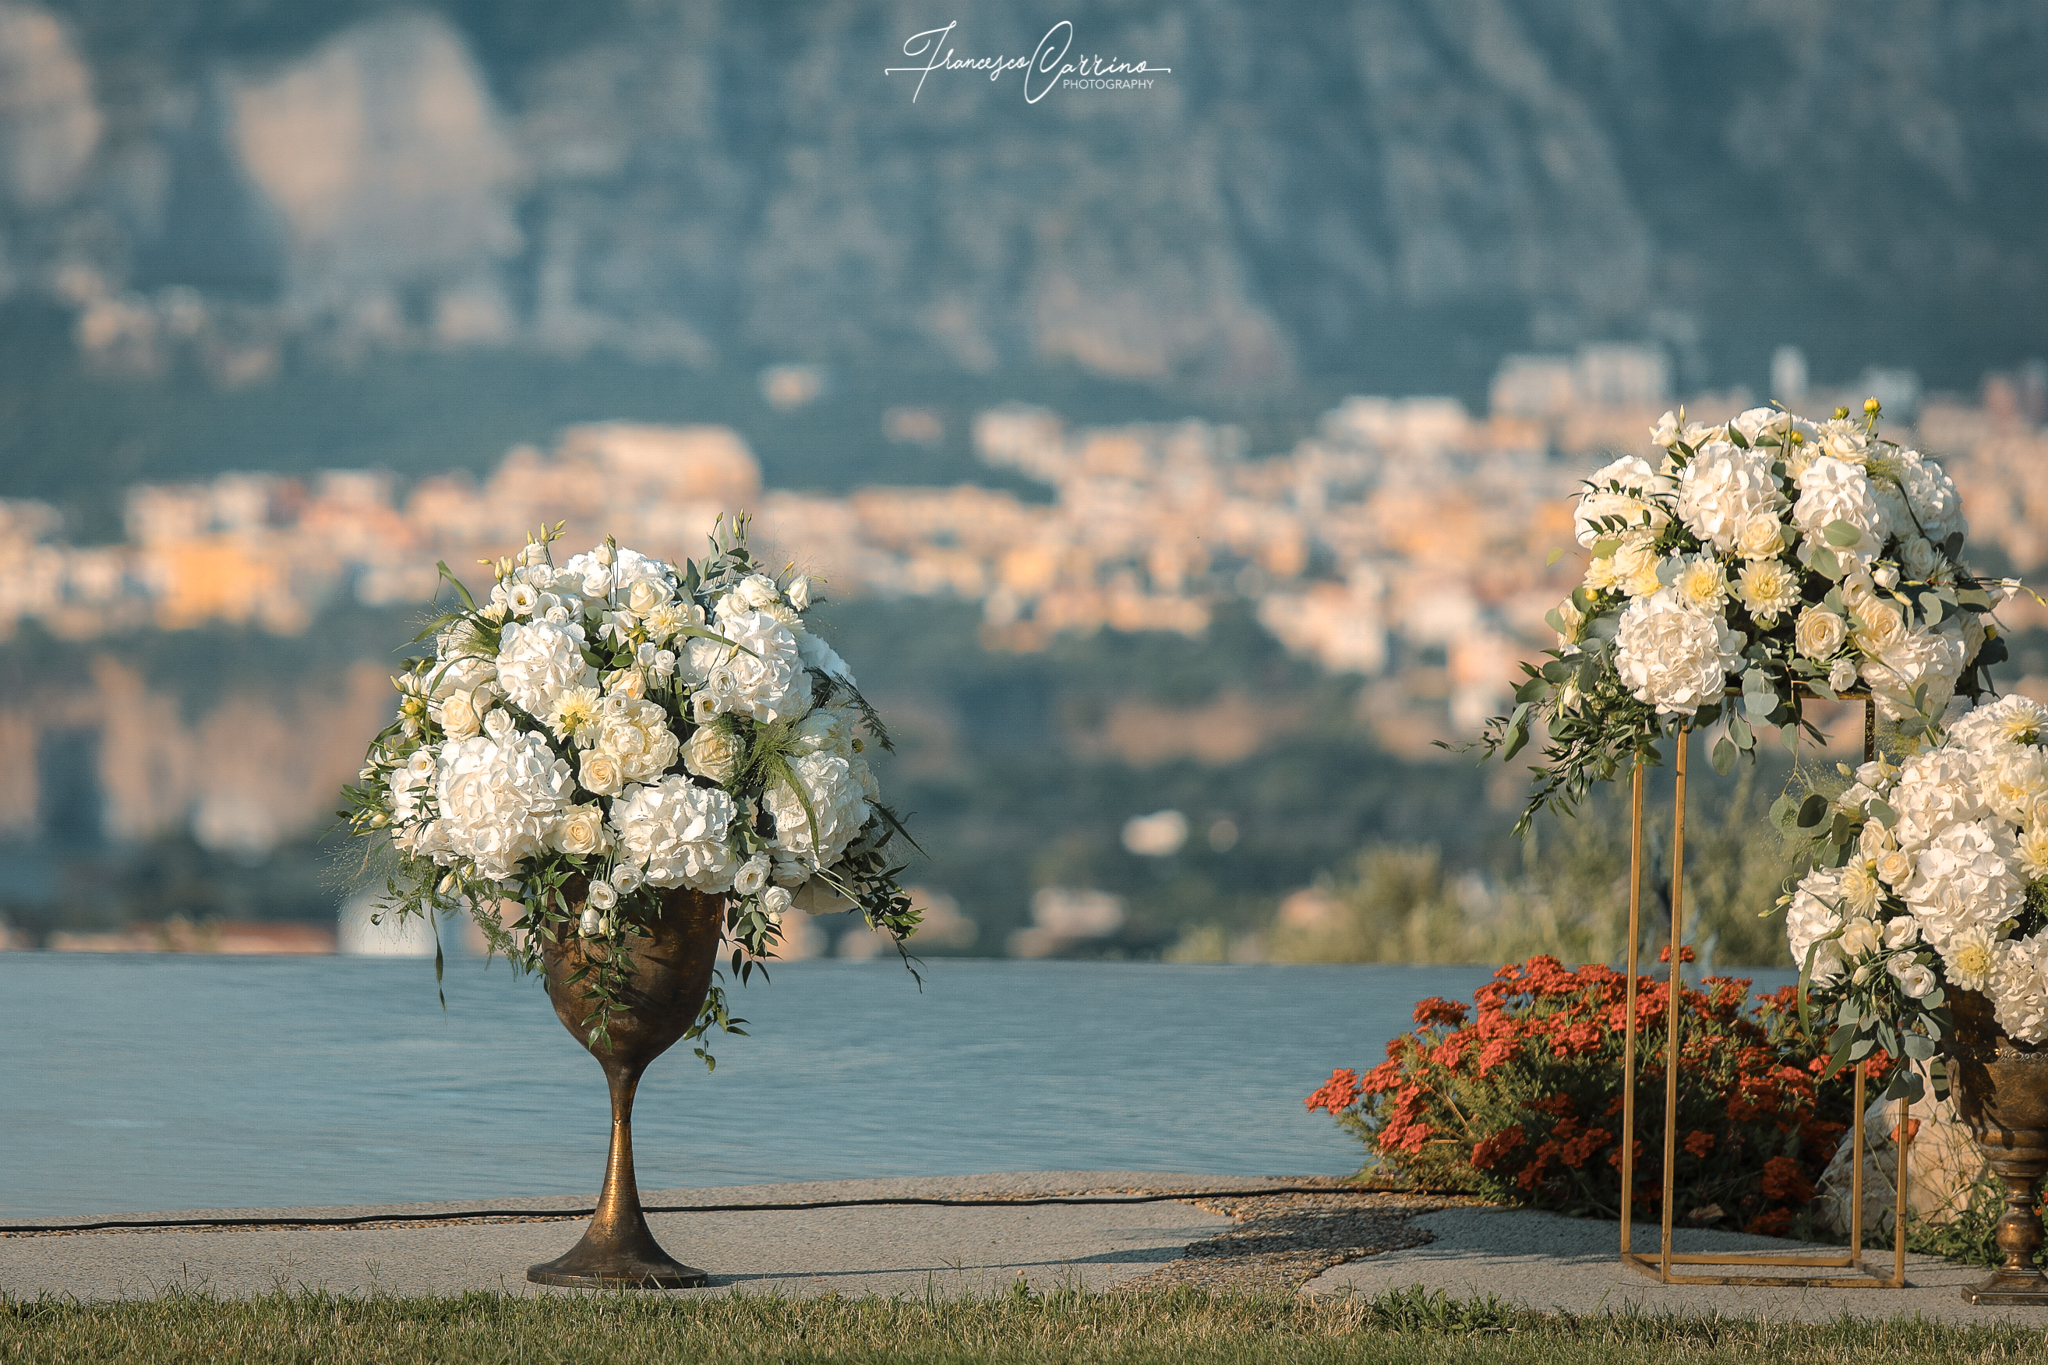 https://www.weddingamalfi.com/wp-content/uploads/Giannenza-13-luglio-2019-8.jpg